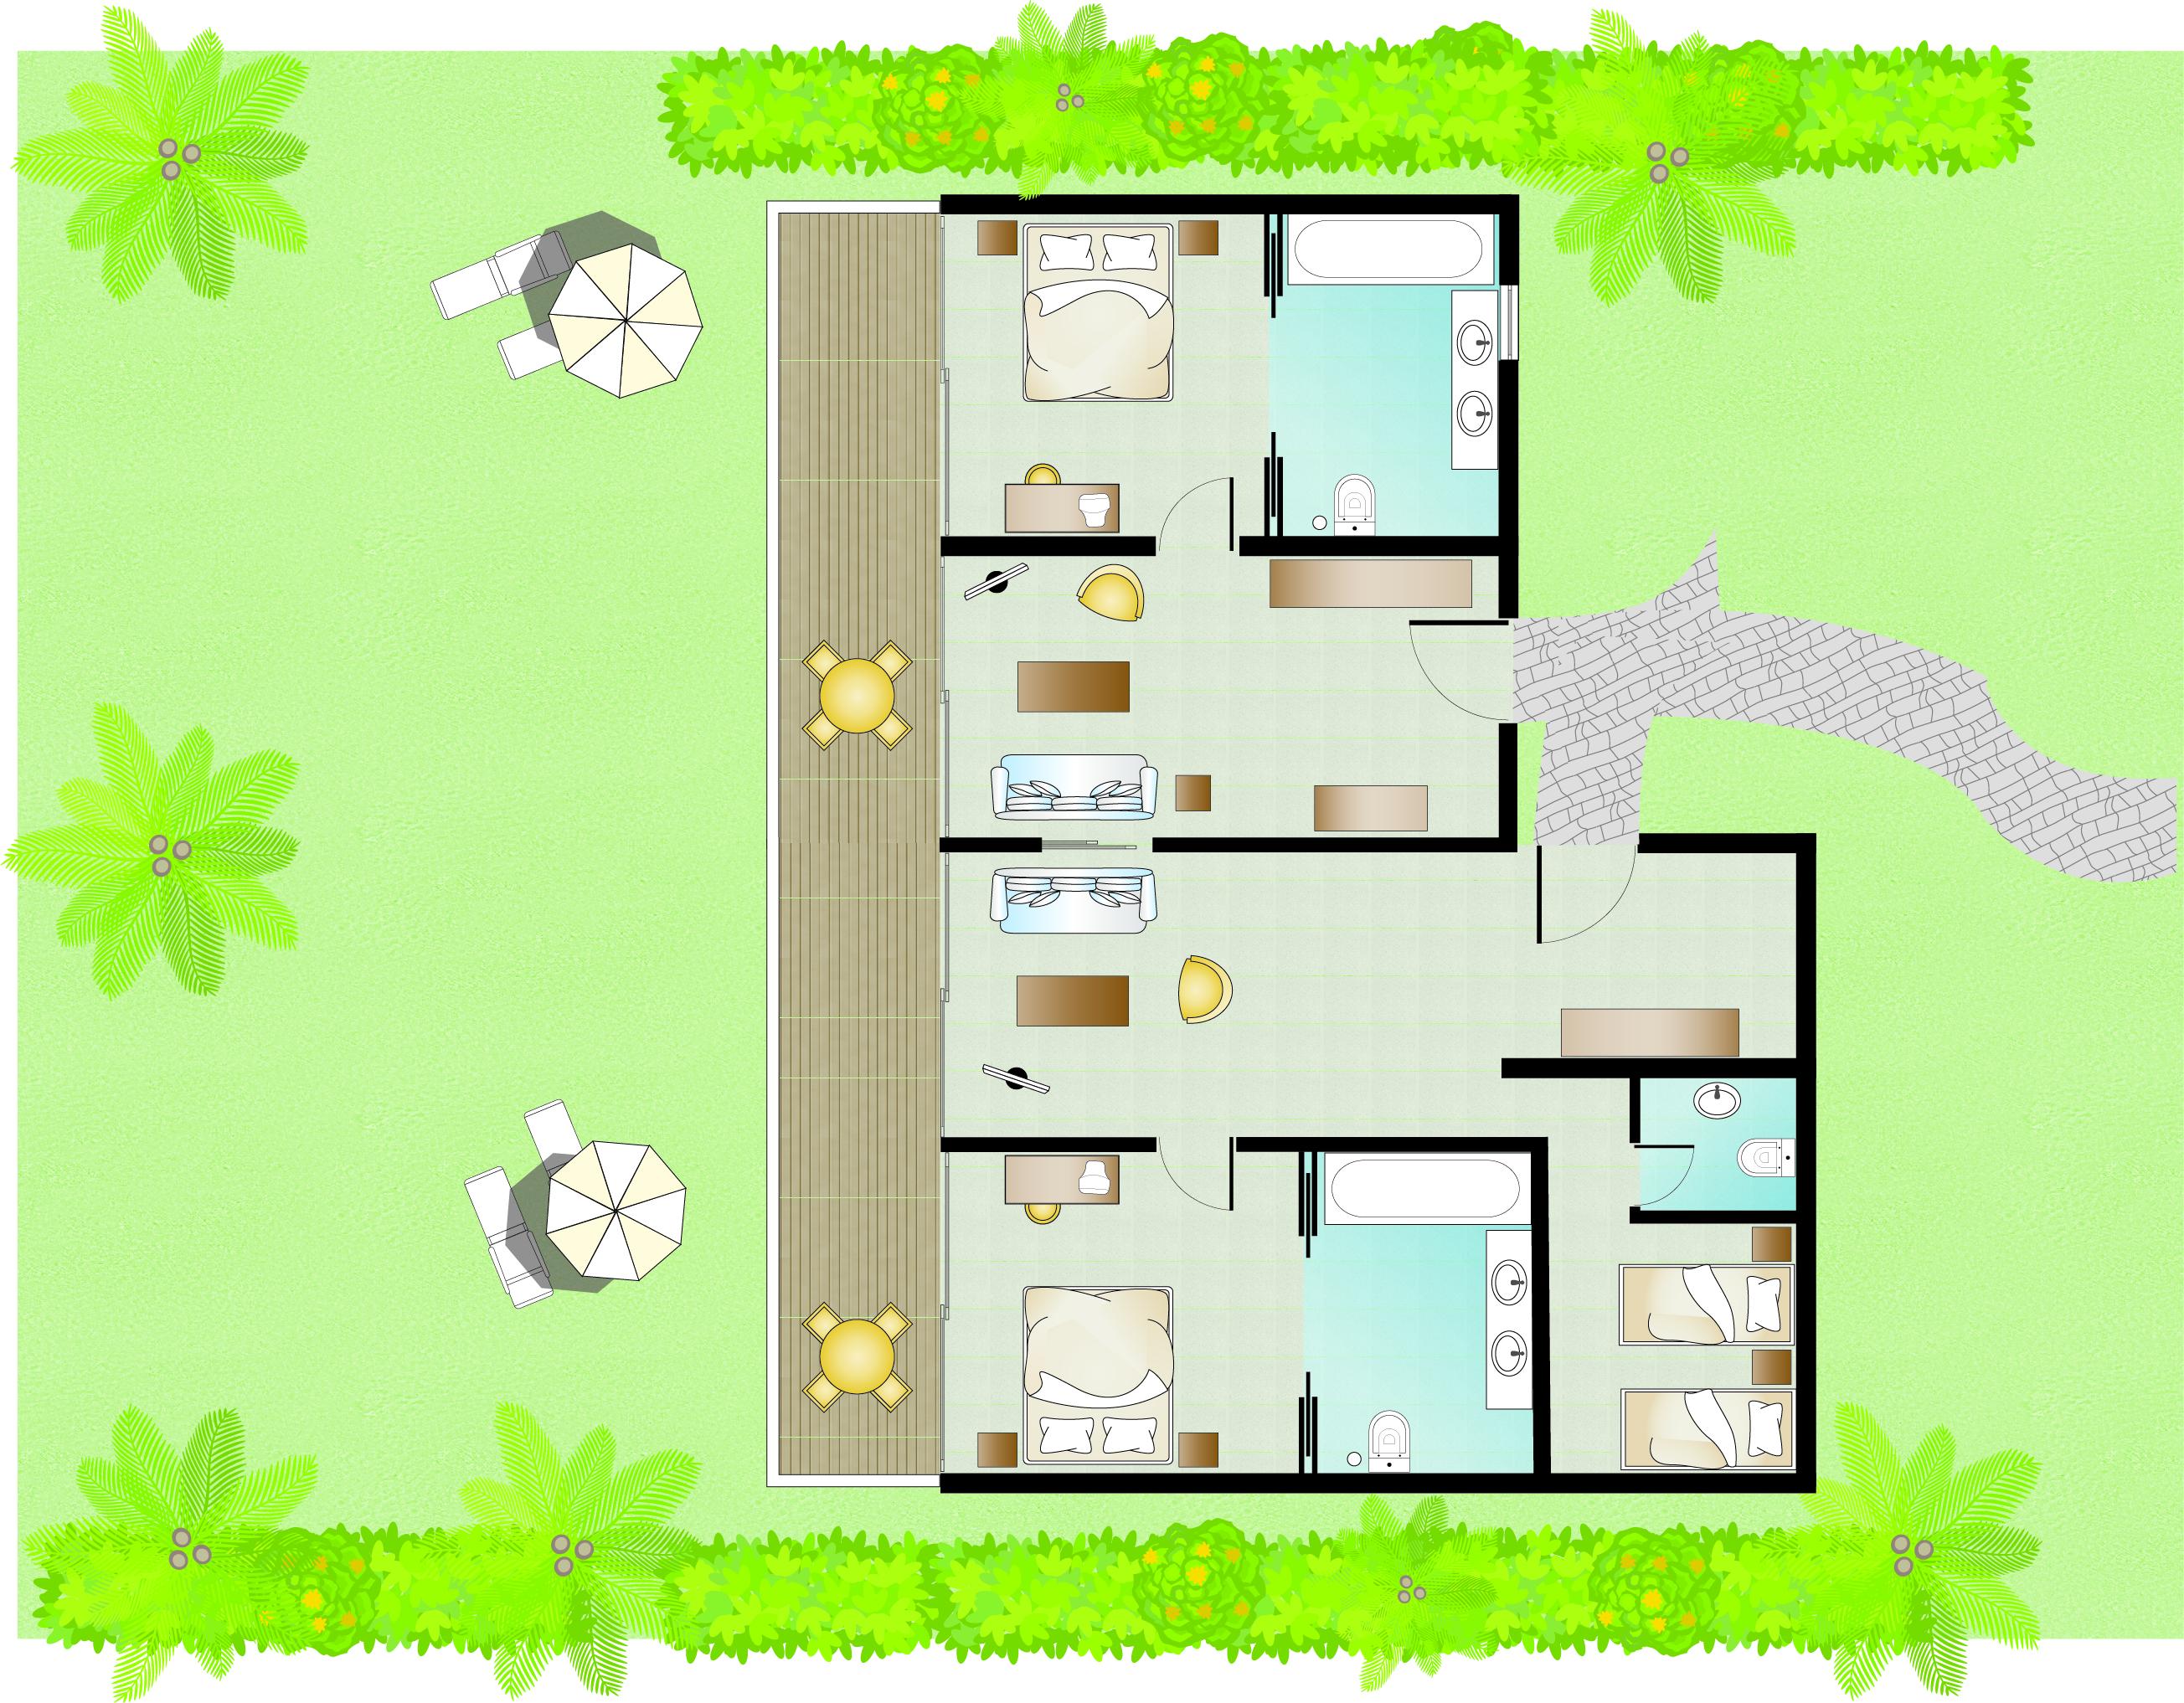 kos-imperial-dream-villa-junior-and-senior-combination